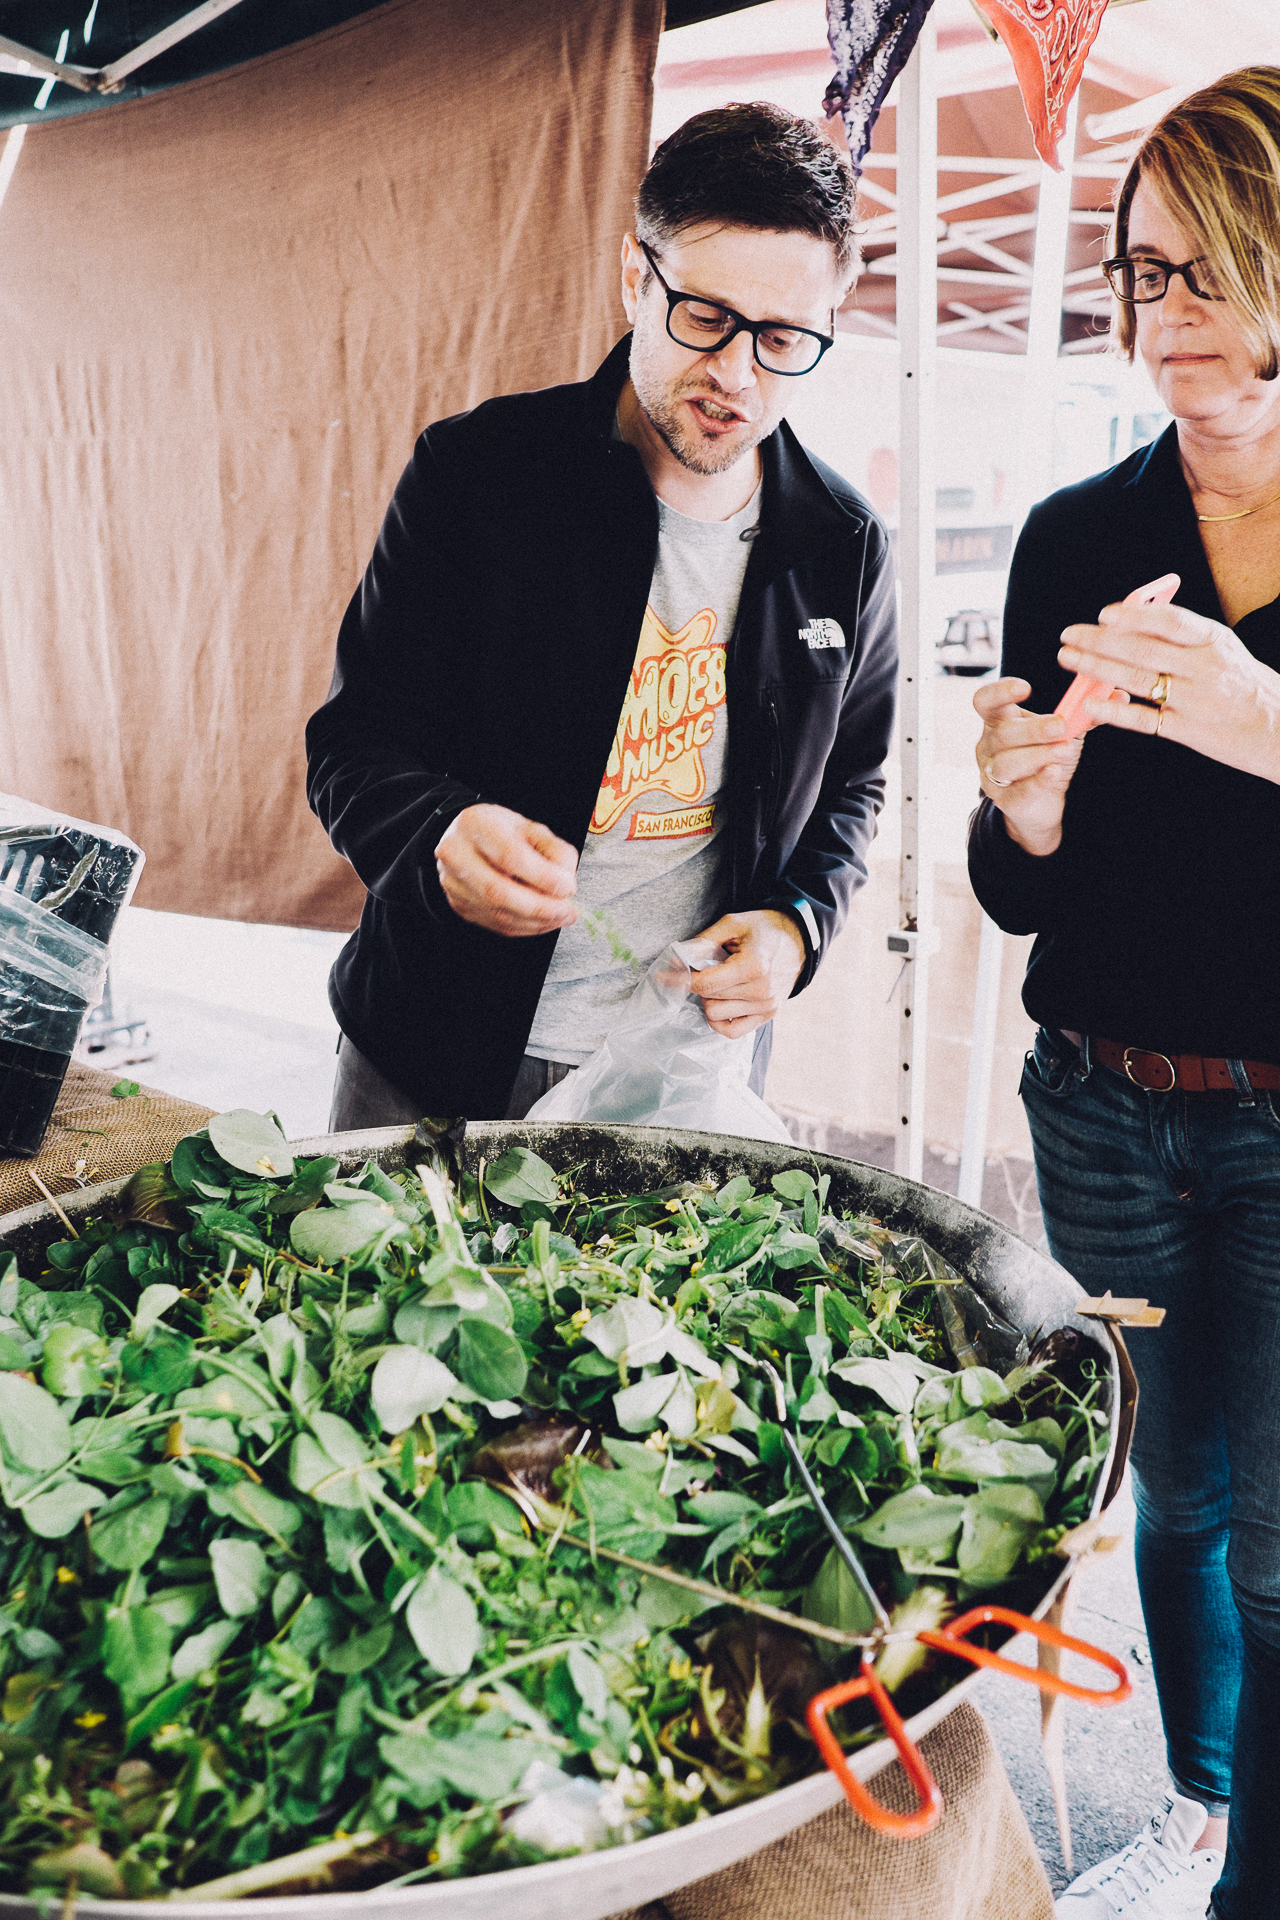 Sampling veggies from local famers.